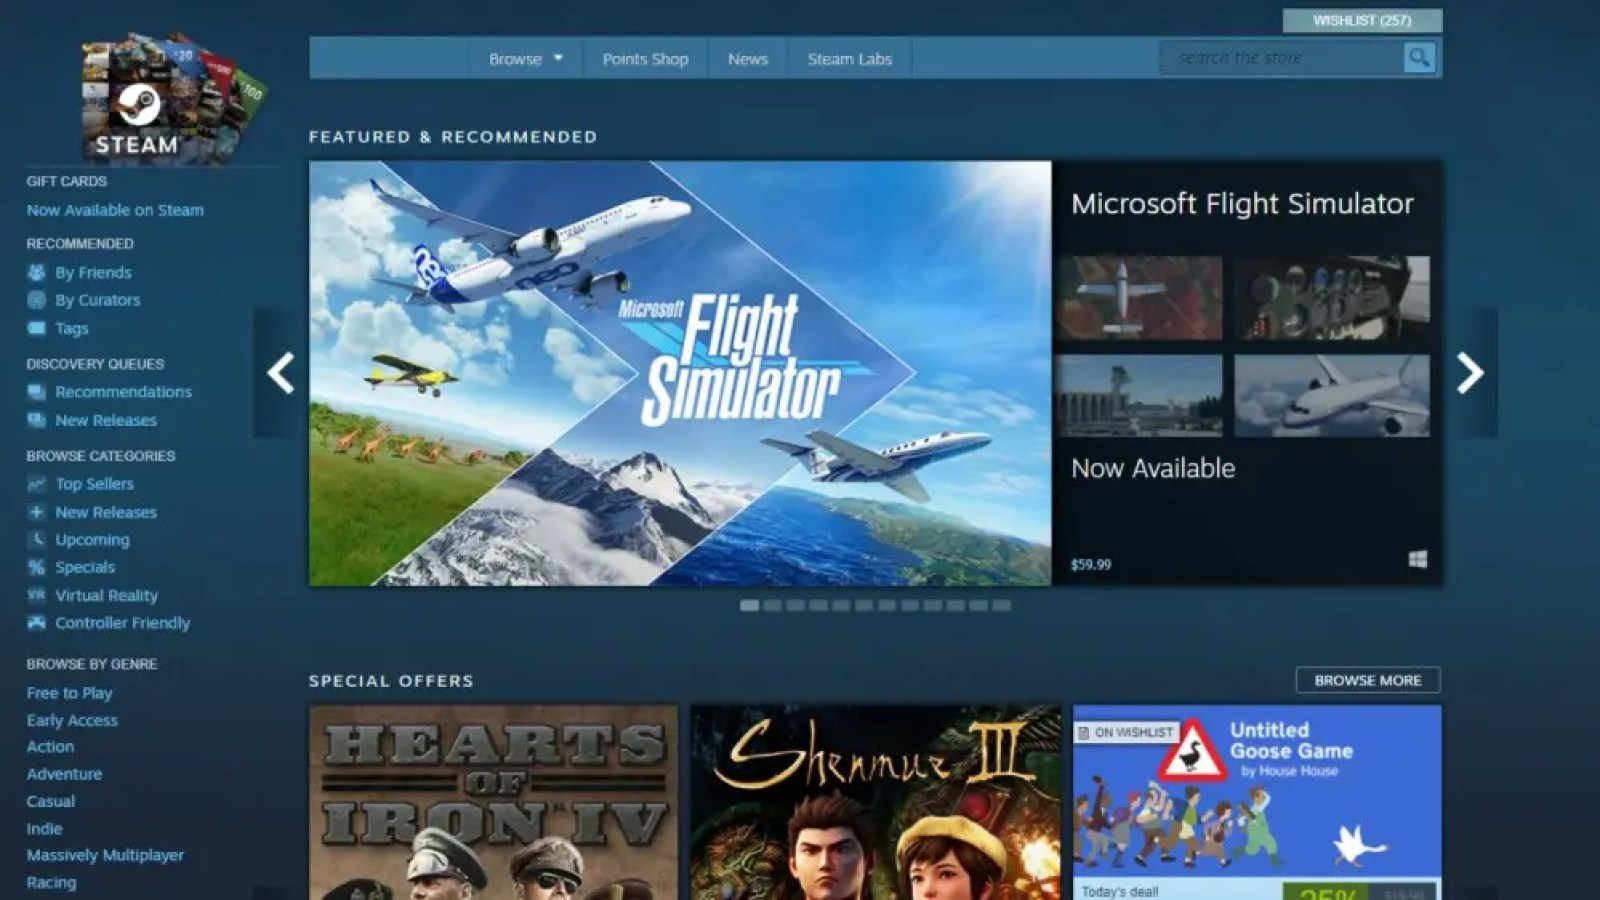 Steam storefront homepage